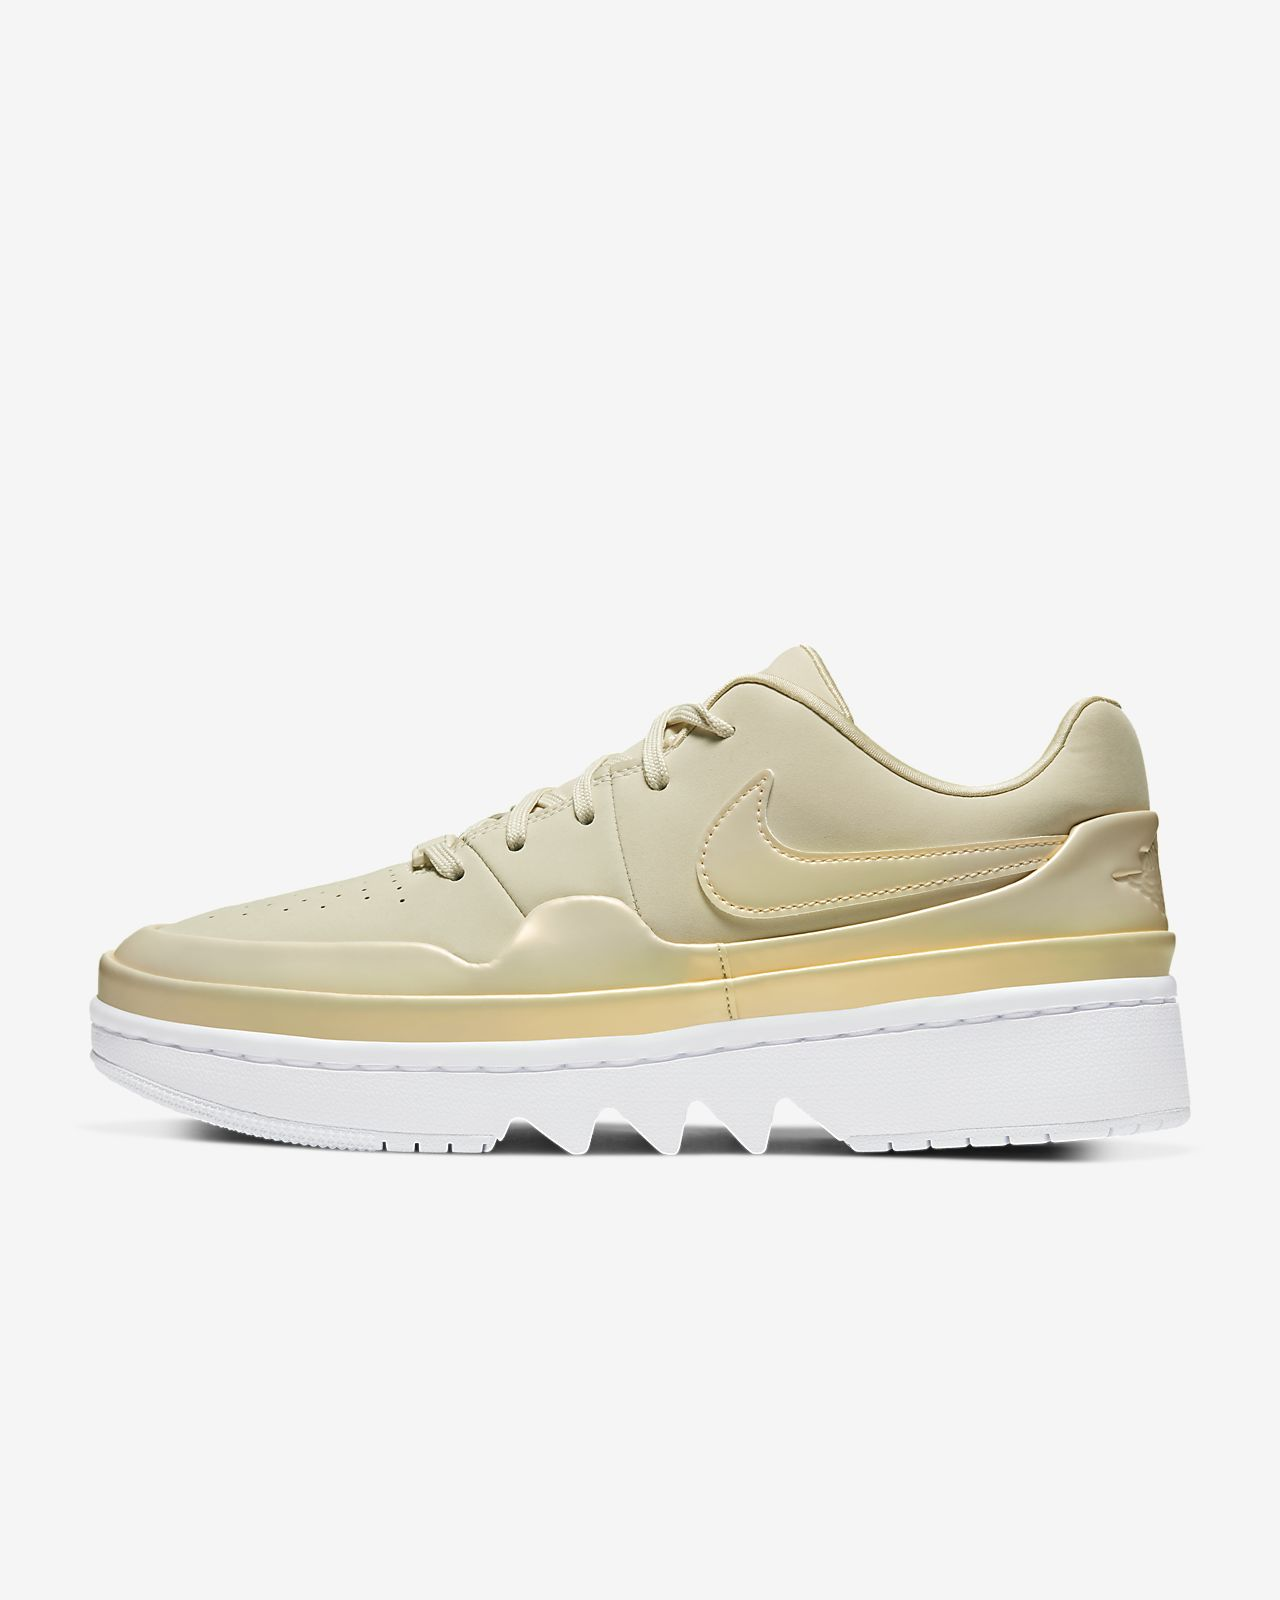 Air Jordan 1 Jester XX 低筒鞋帶版 SE 女鞋